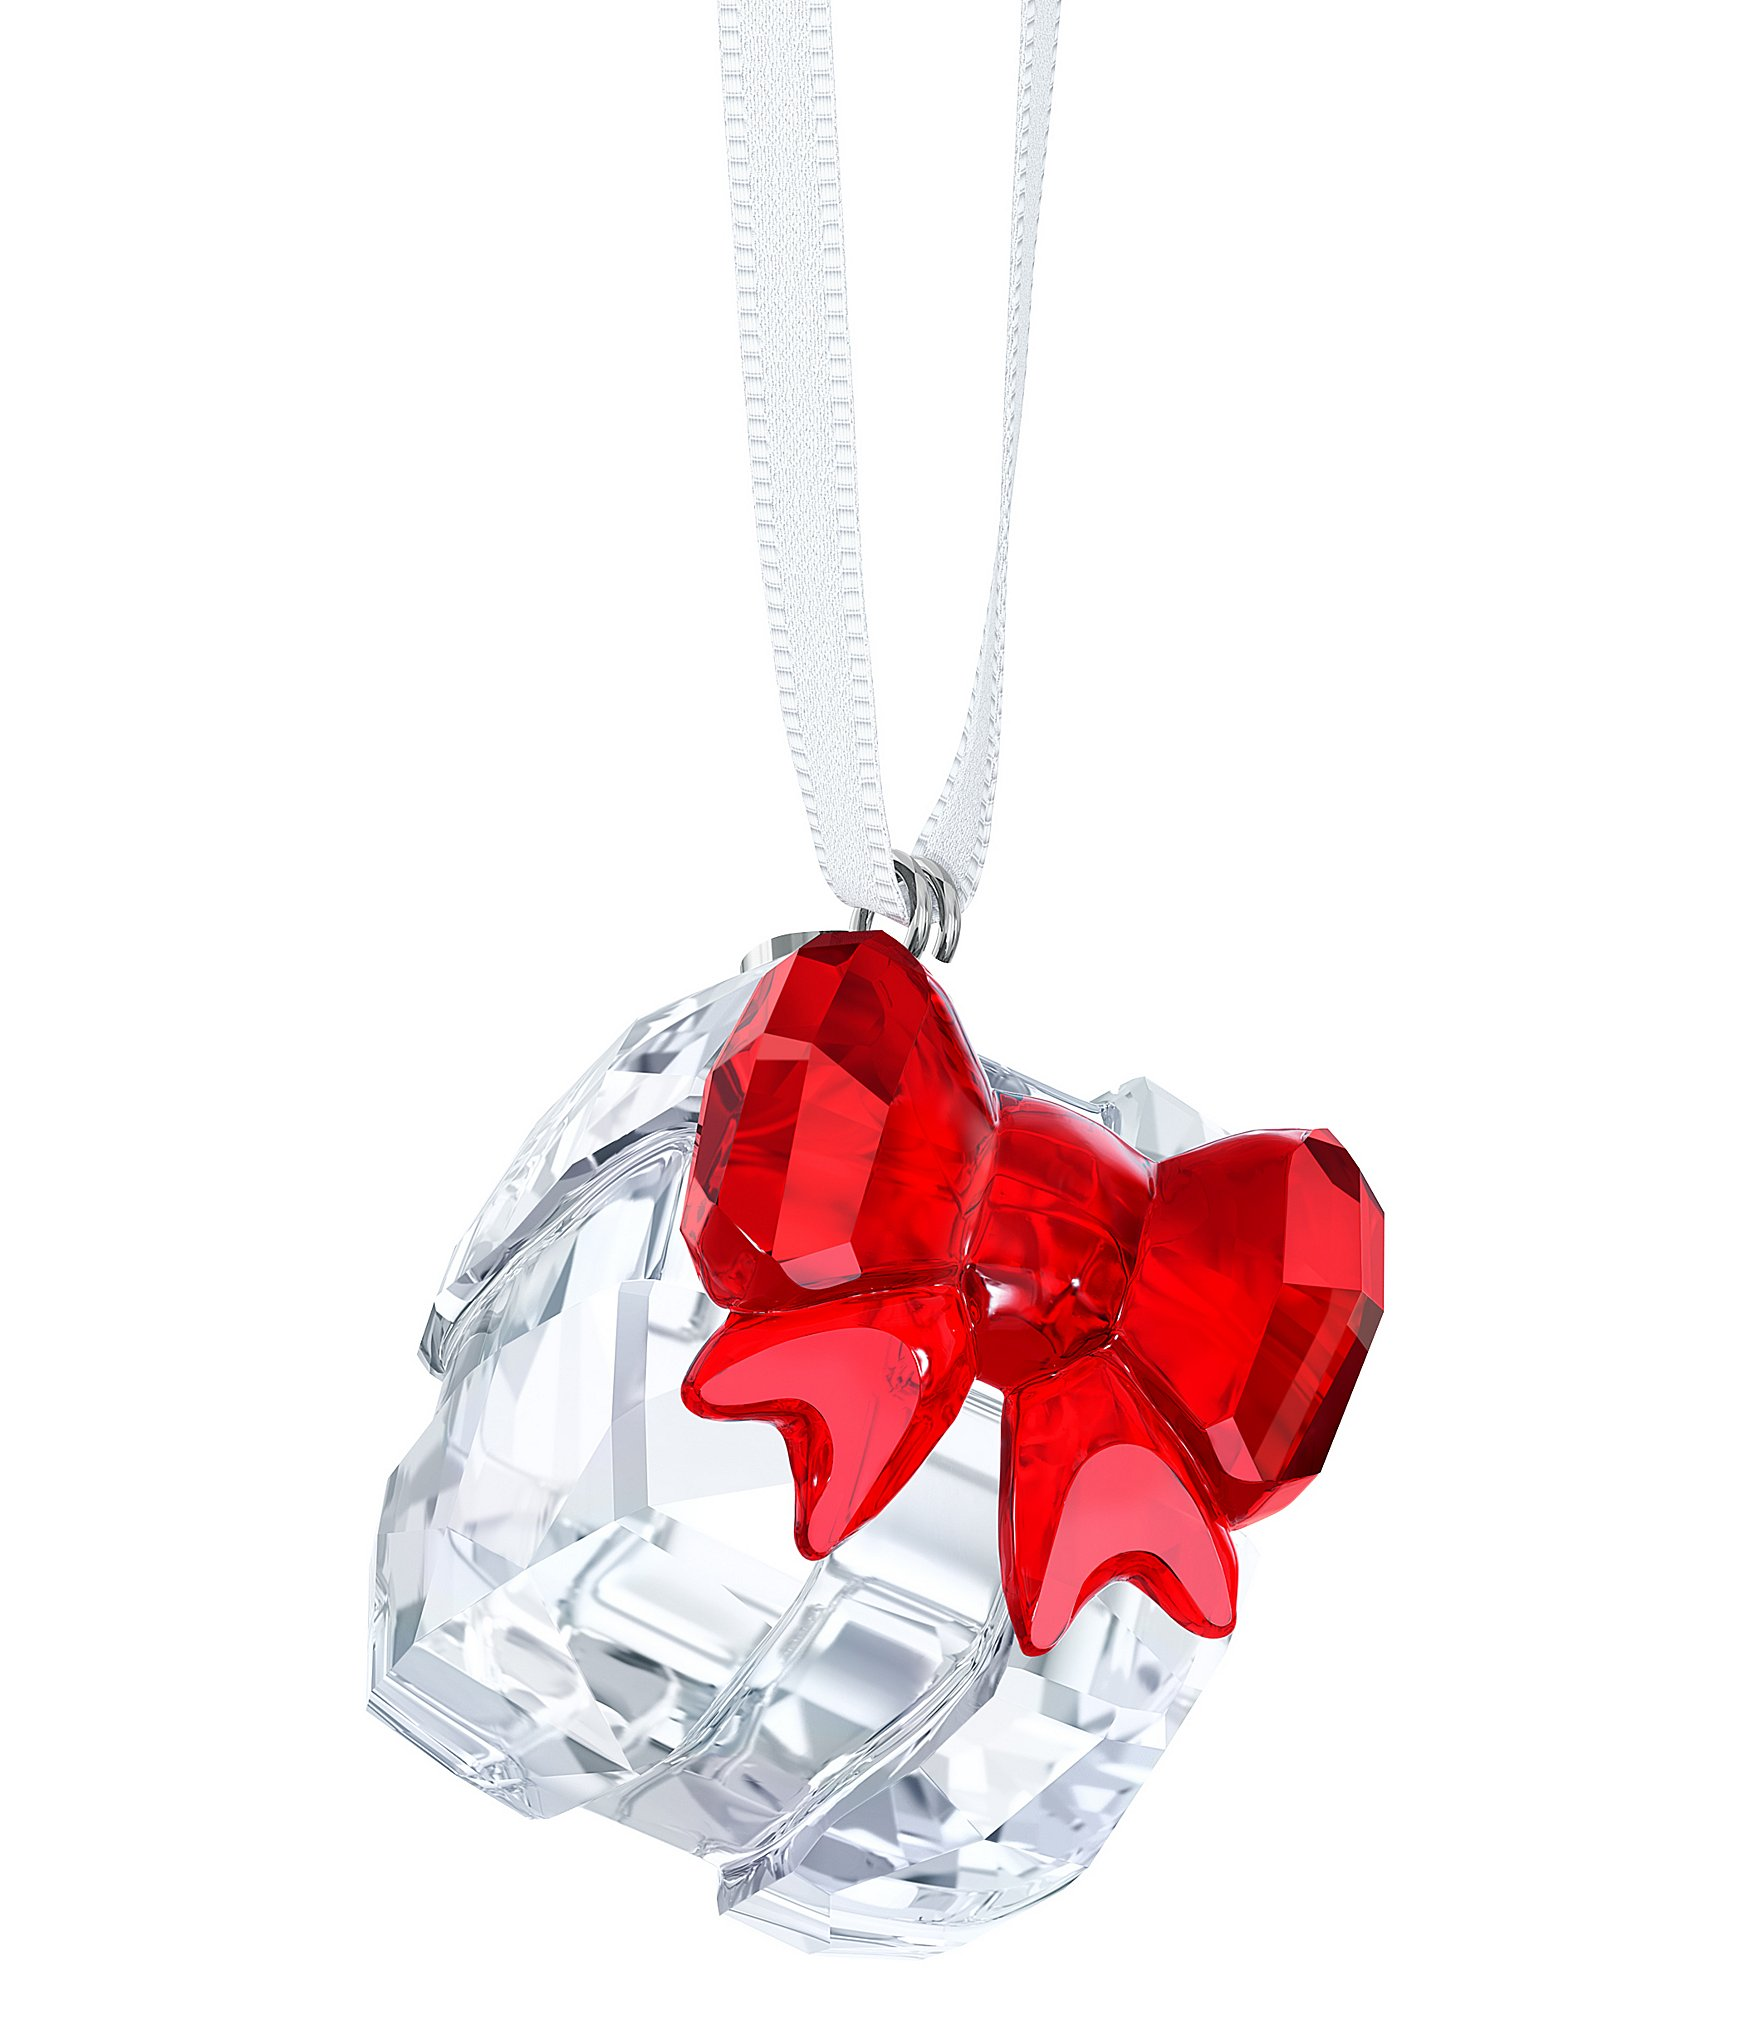 Swarovski crystal christmas gift ornament dillards for Christmas ornament sale clearance